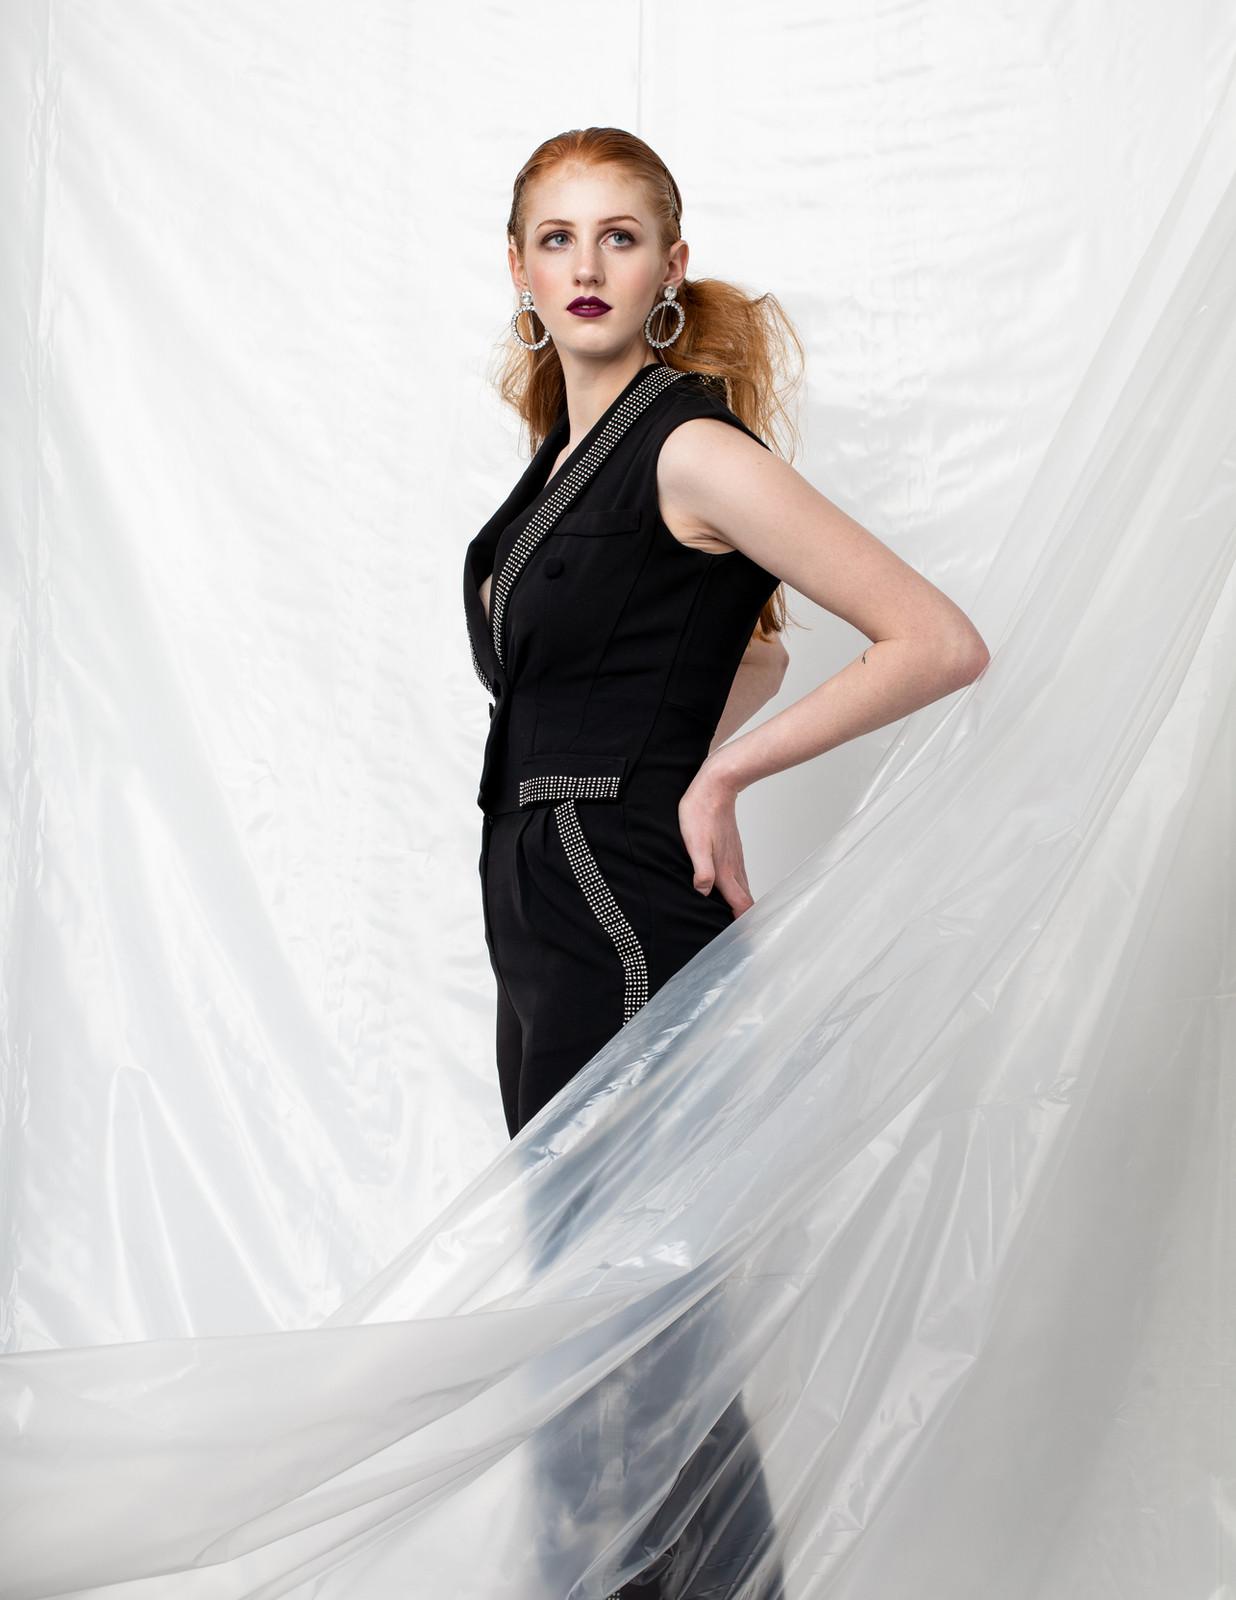 Model Agency | Structure Model Management | Jenna Zimmer